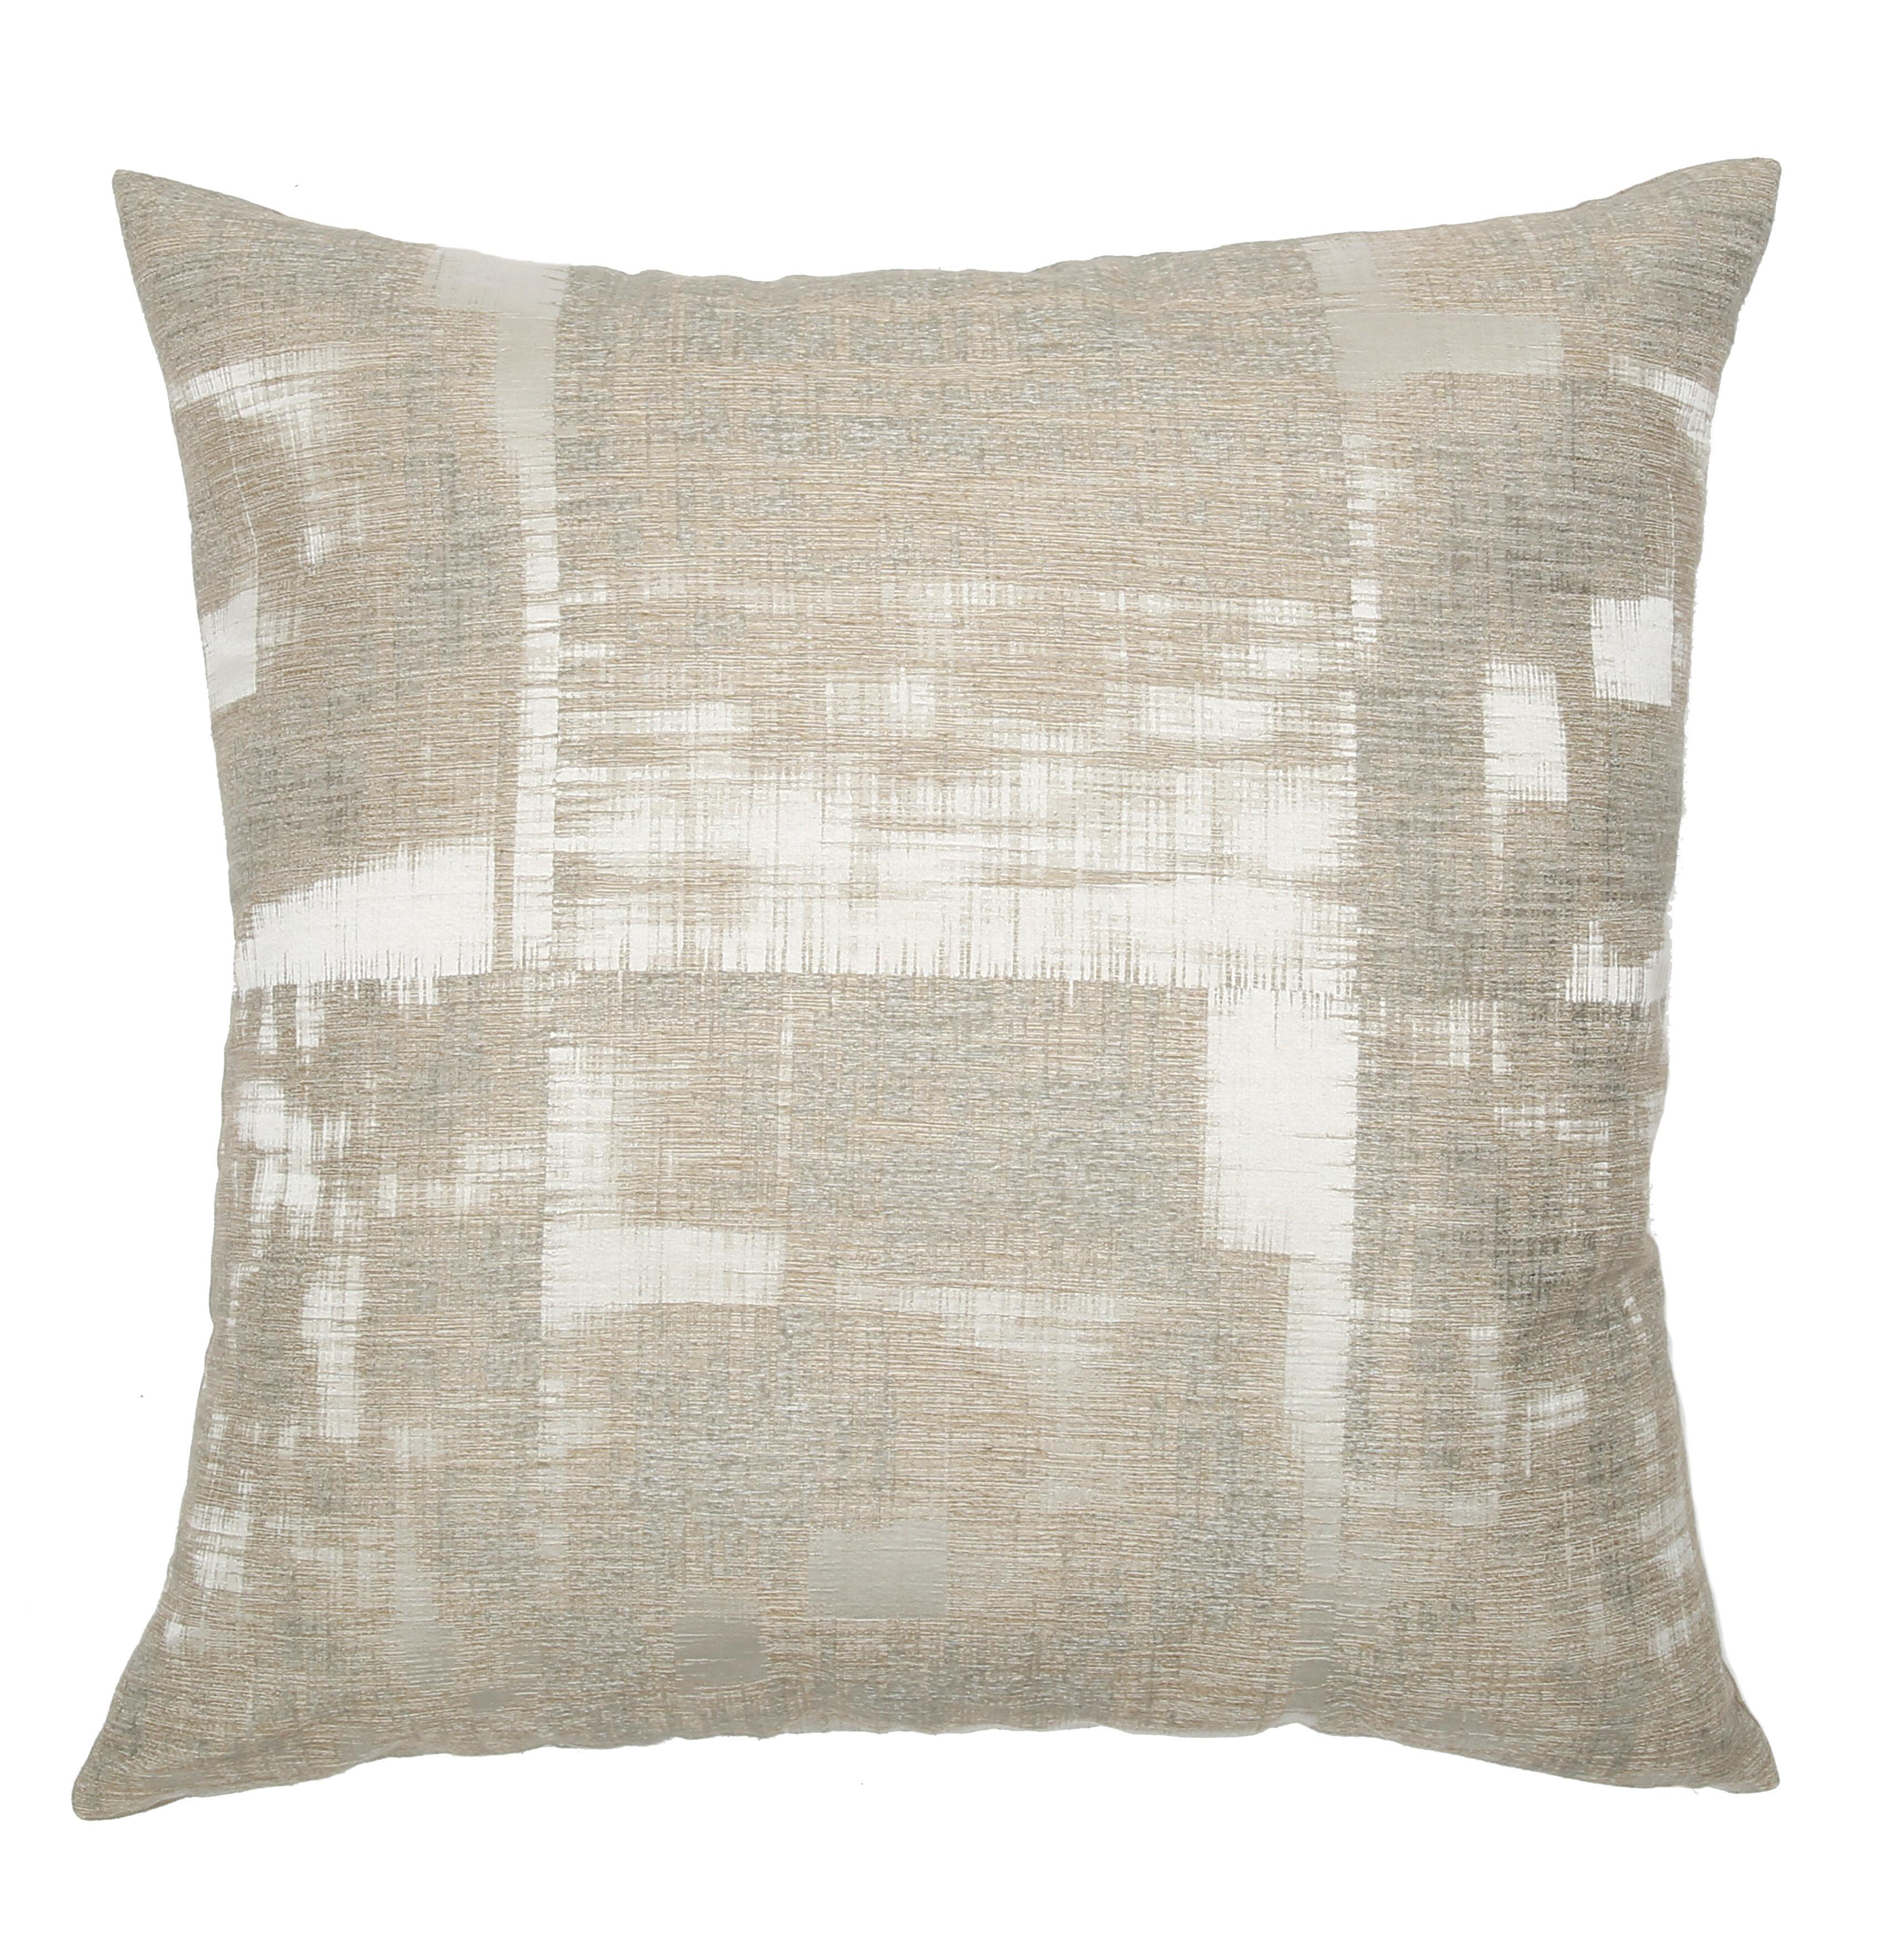 Toss By Daniel Stuart Studio Woodstock Feathers Abstract Throw Pillow Wayfair